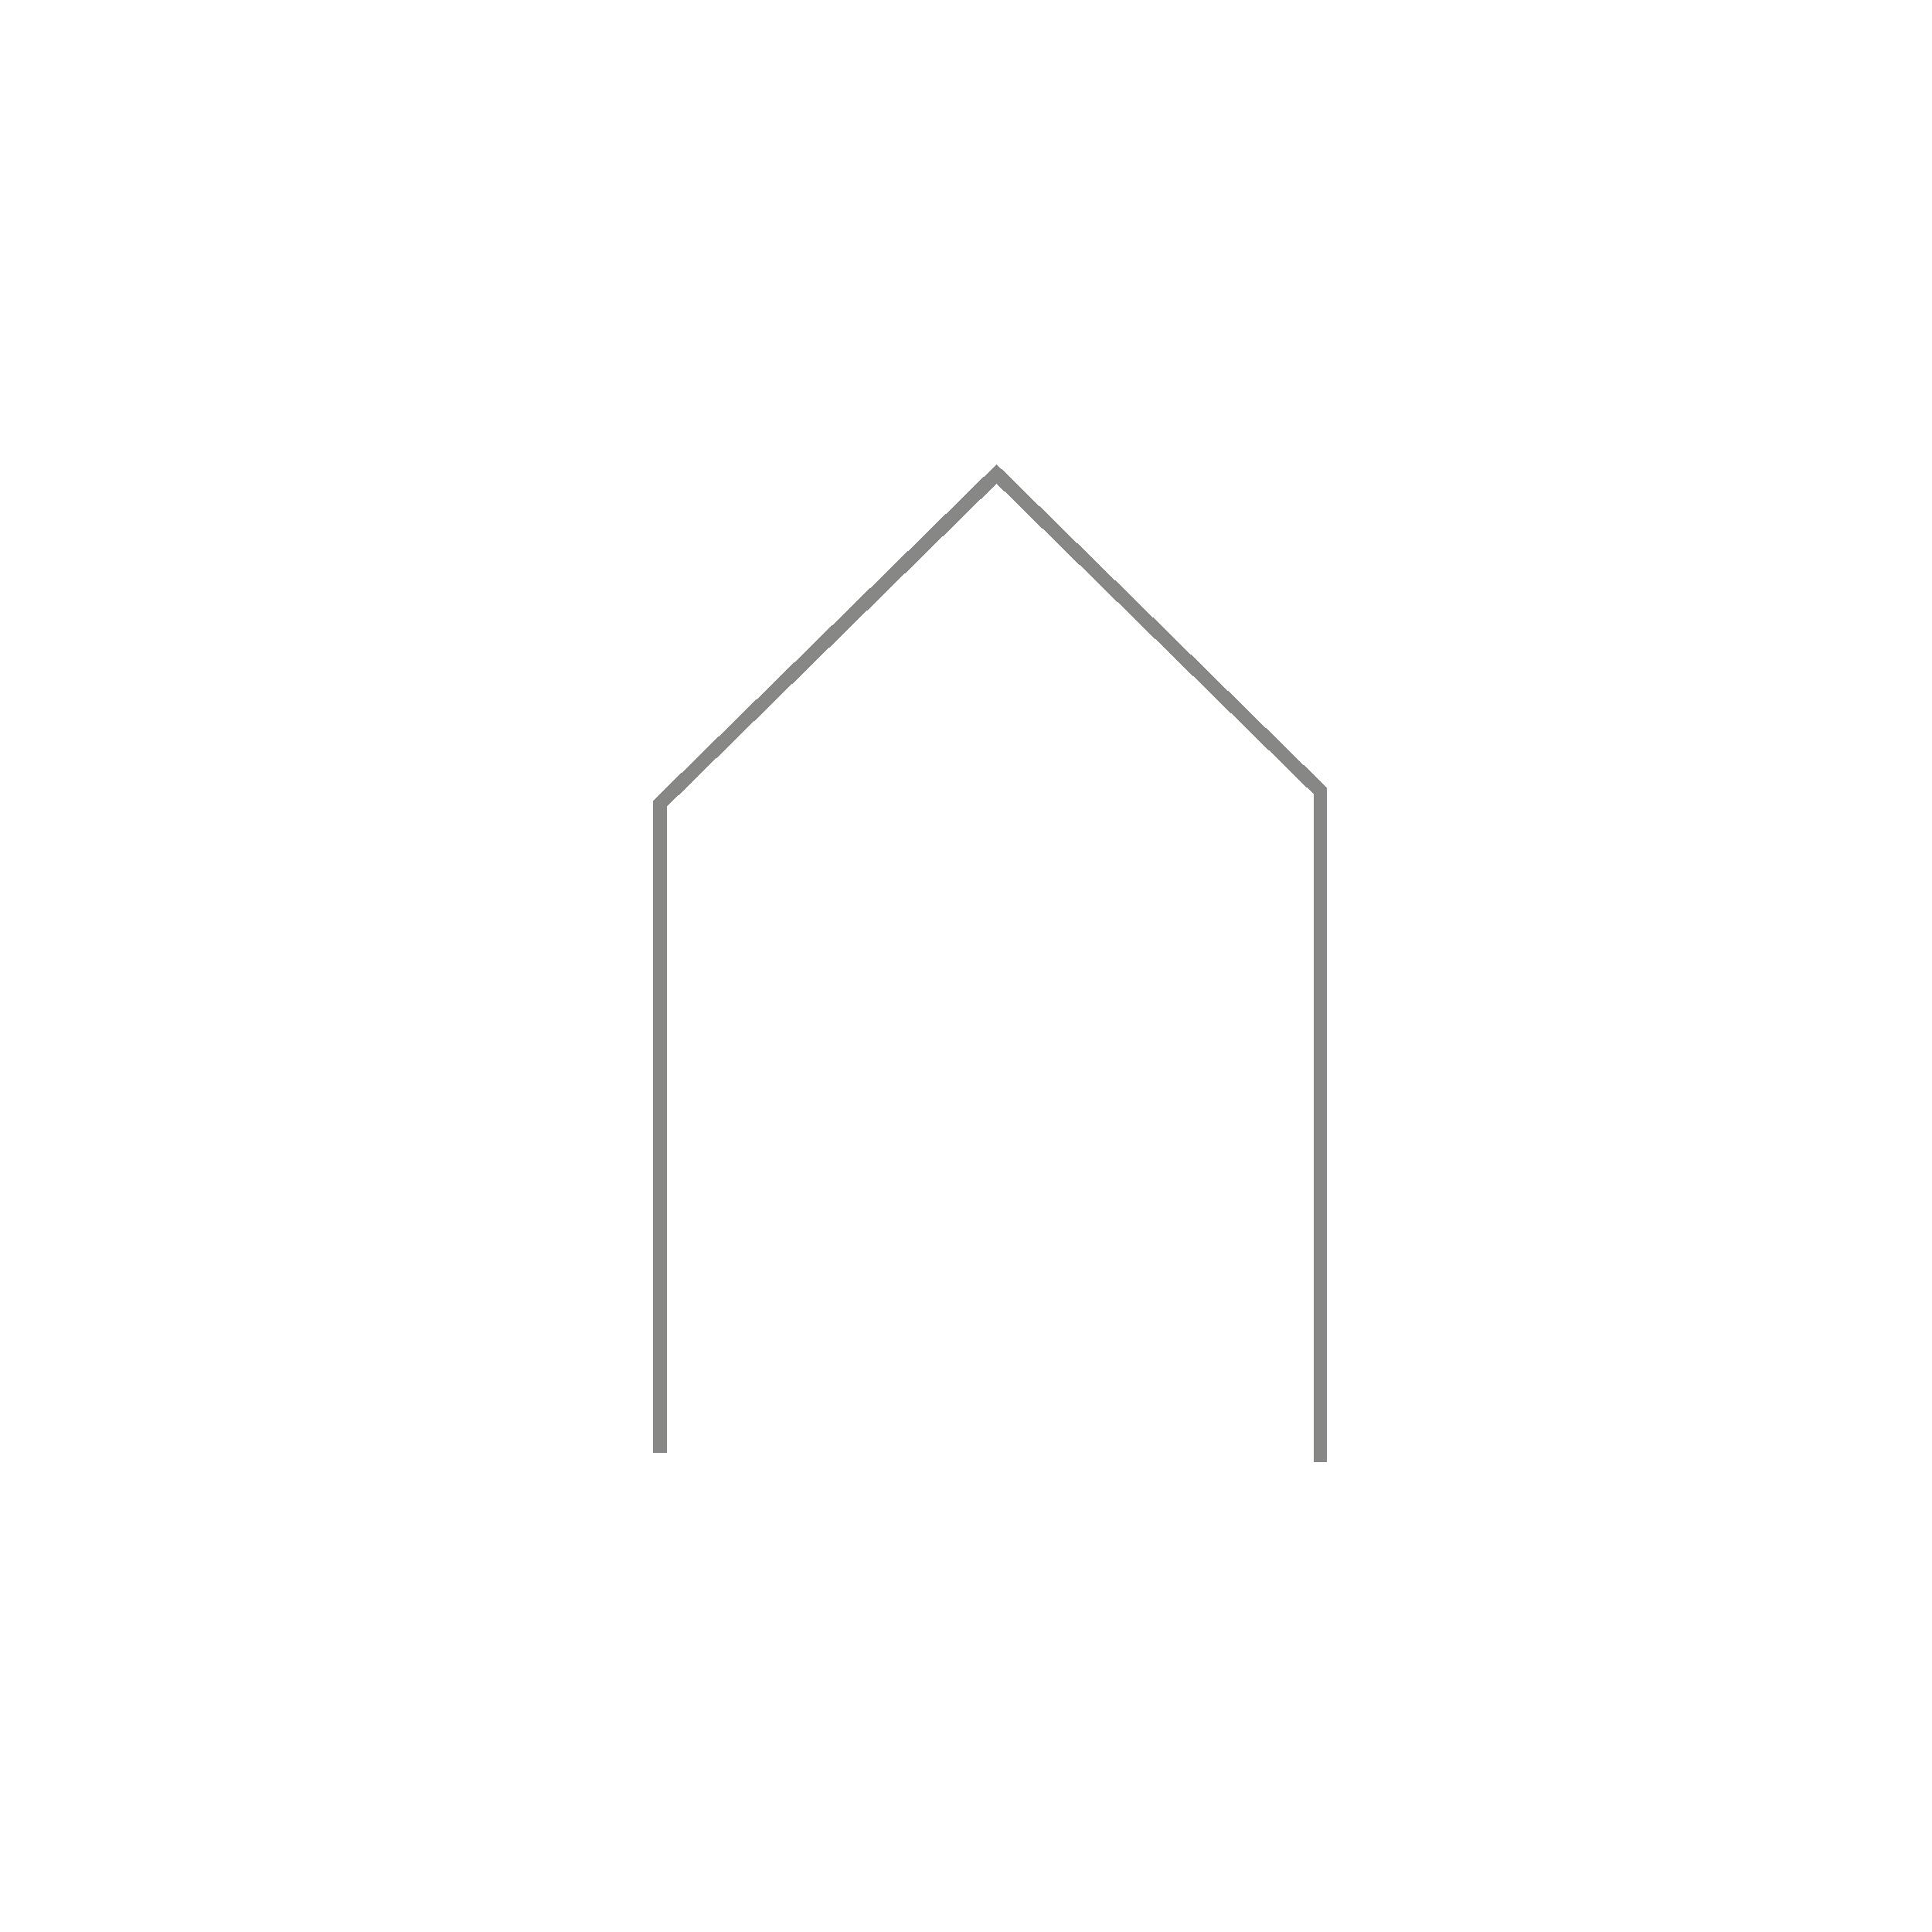 symb-home-03